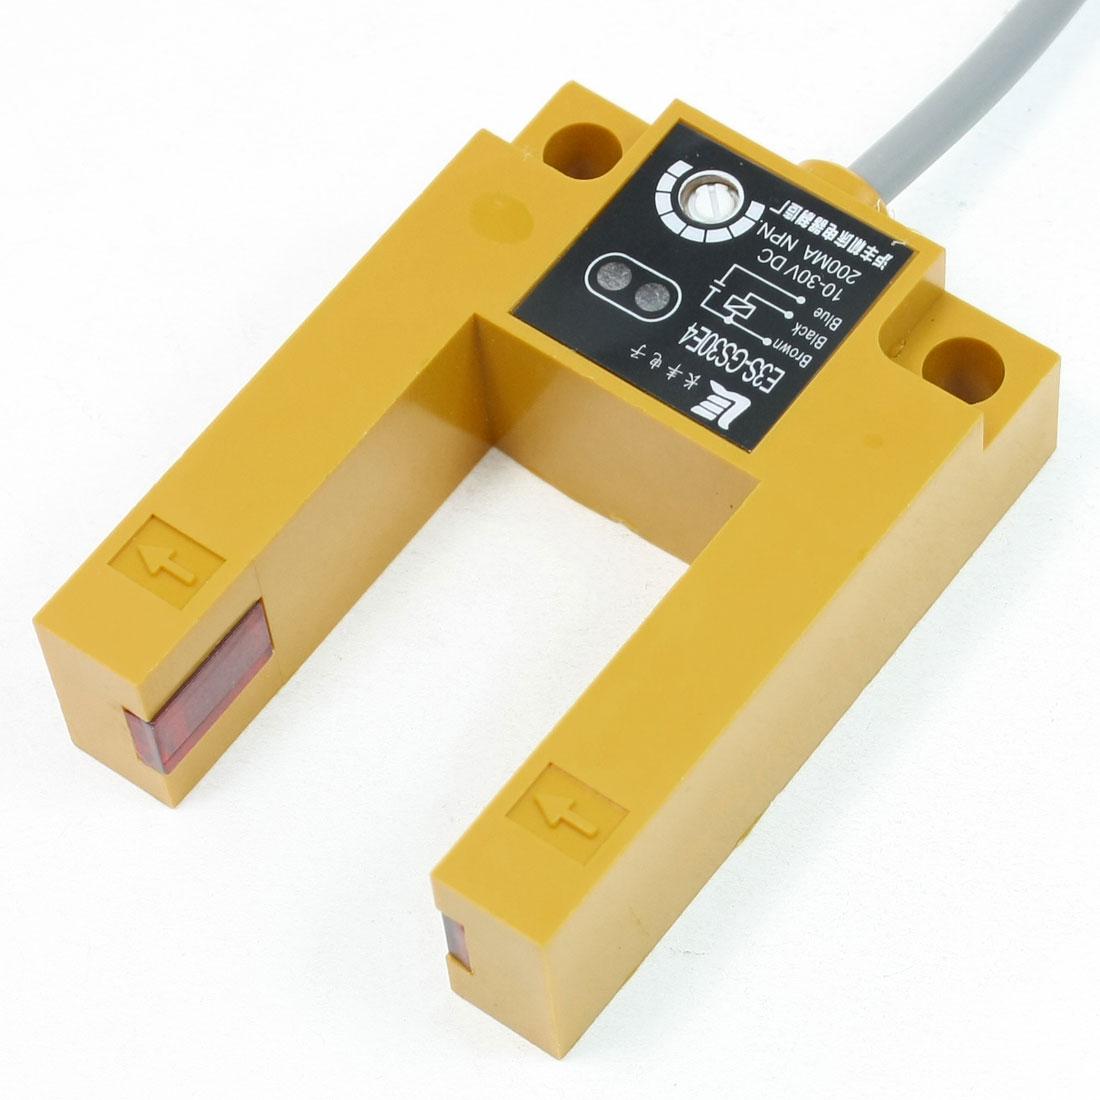 DC 10-30V 200mA 3 Wires Groove Type Photoelectric Sensor E3S-GS30E4